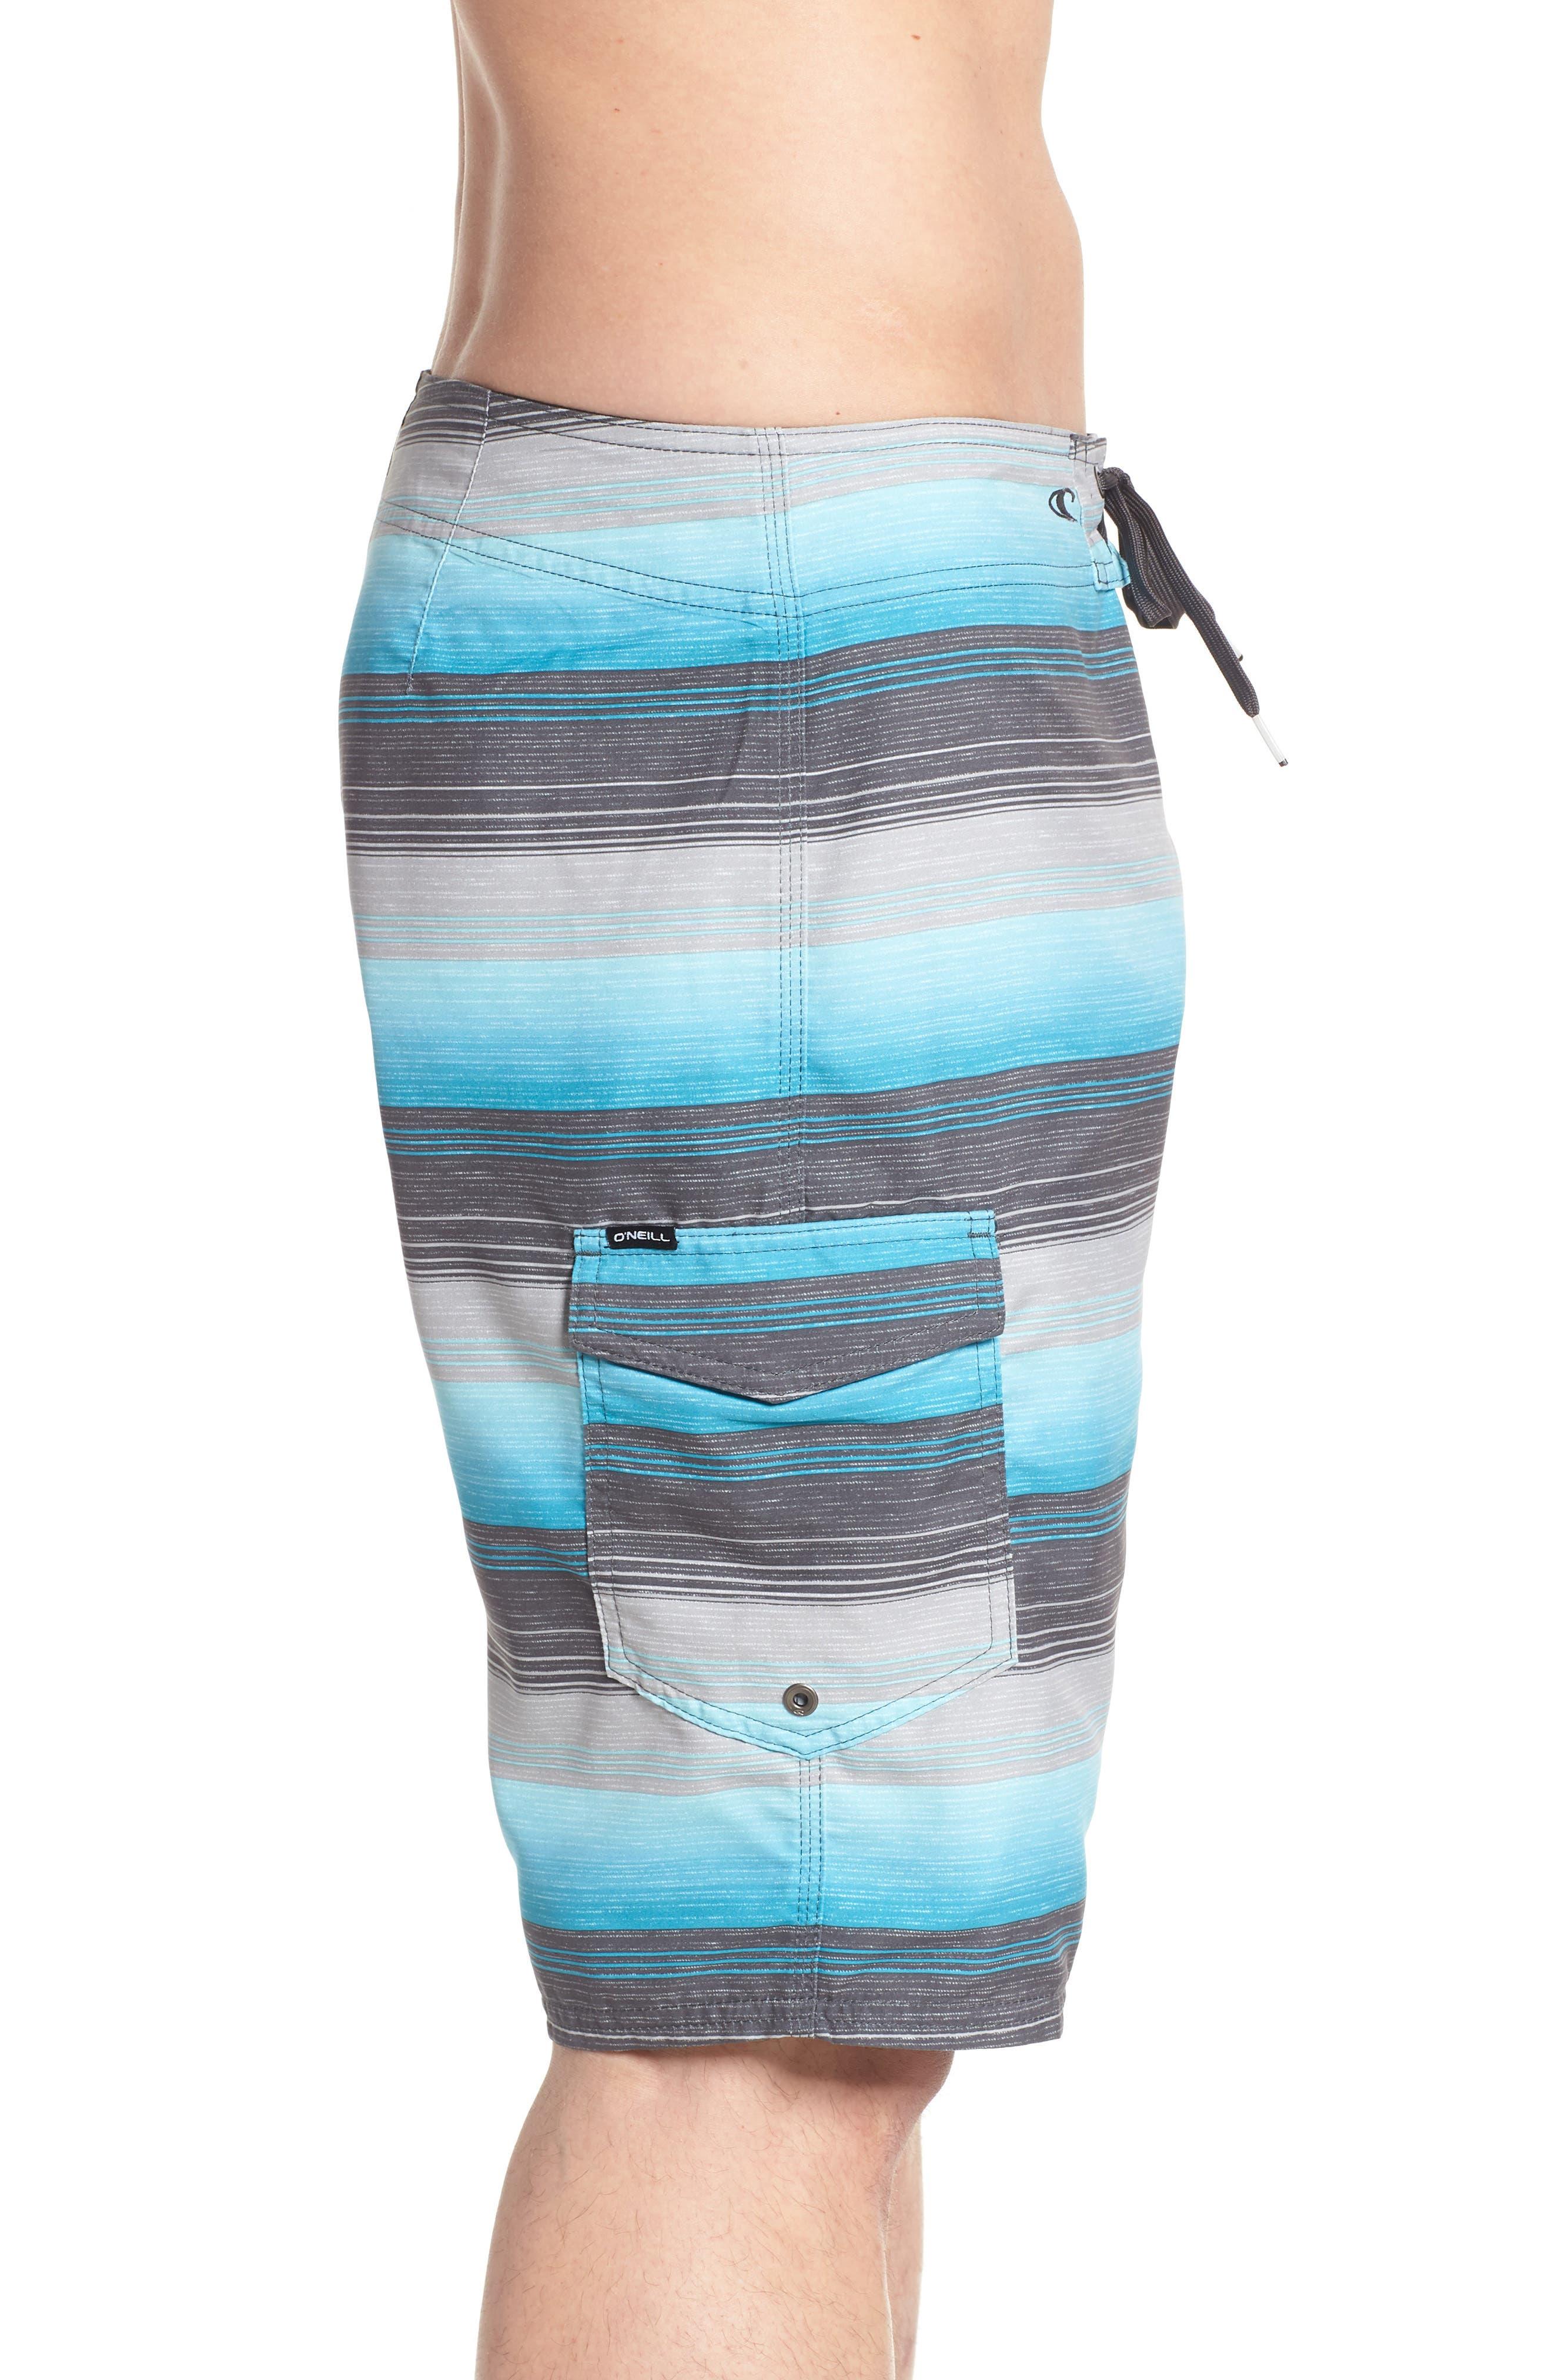 Santa Cruz Board Shorts,                             Alternate thumbnail 3, color,                             Ocean